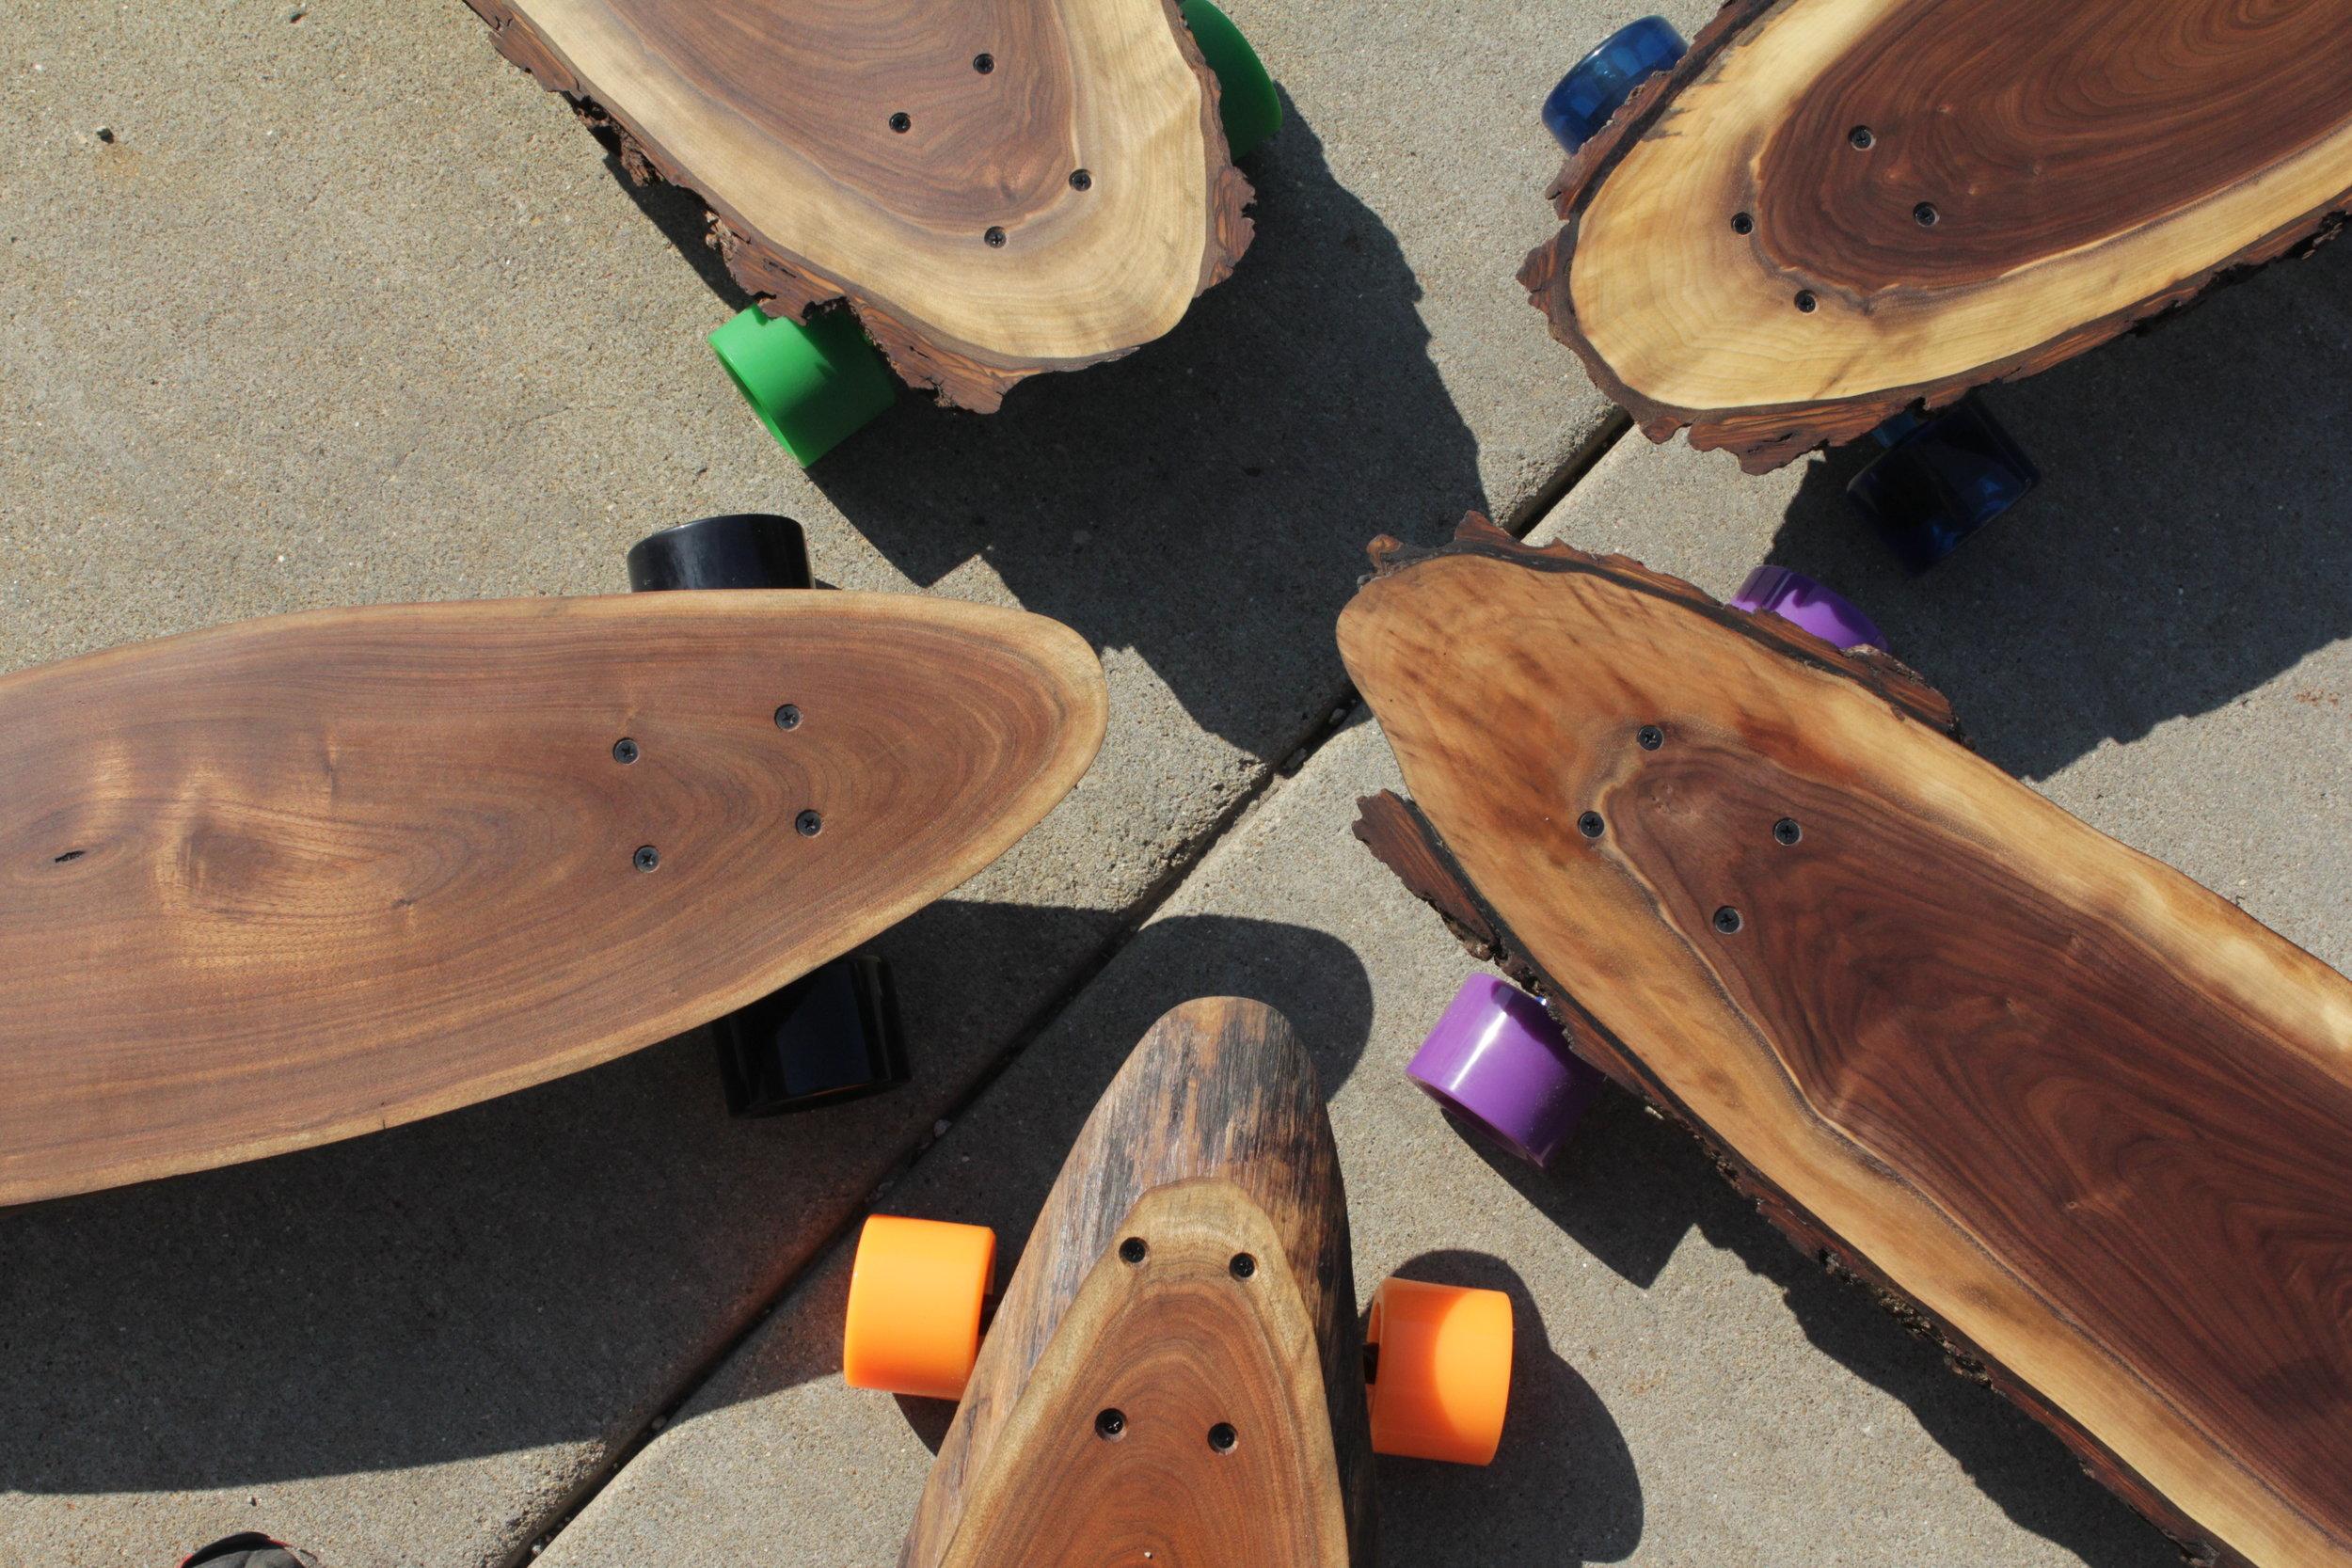 Logan Blvd. Boards